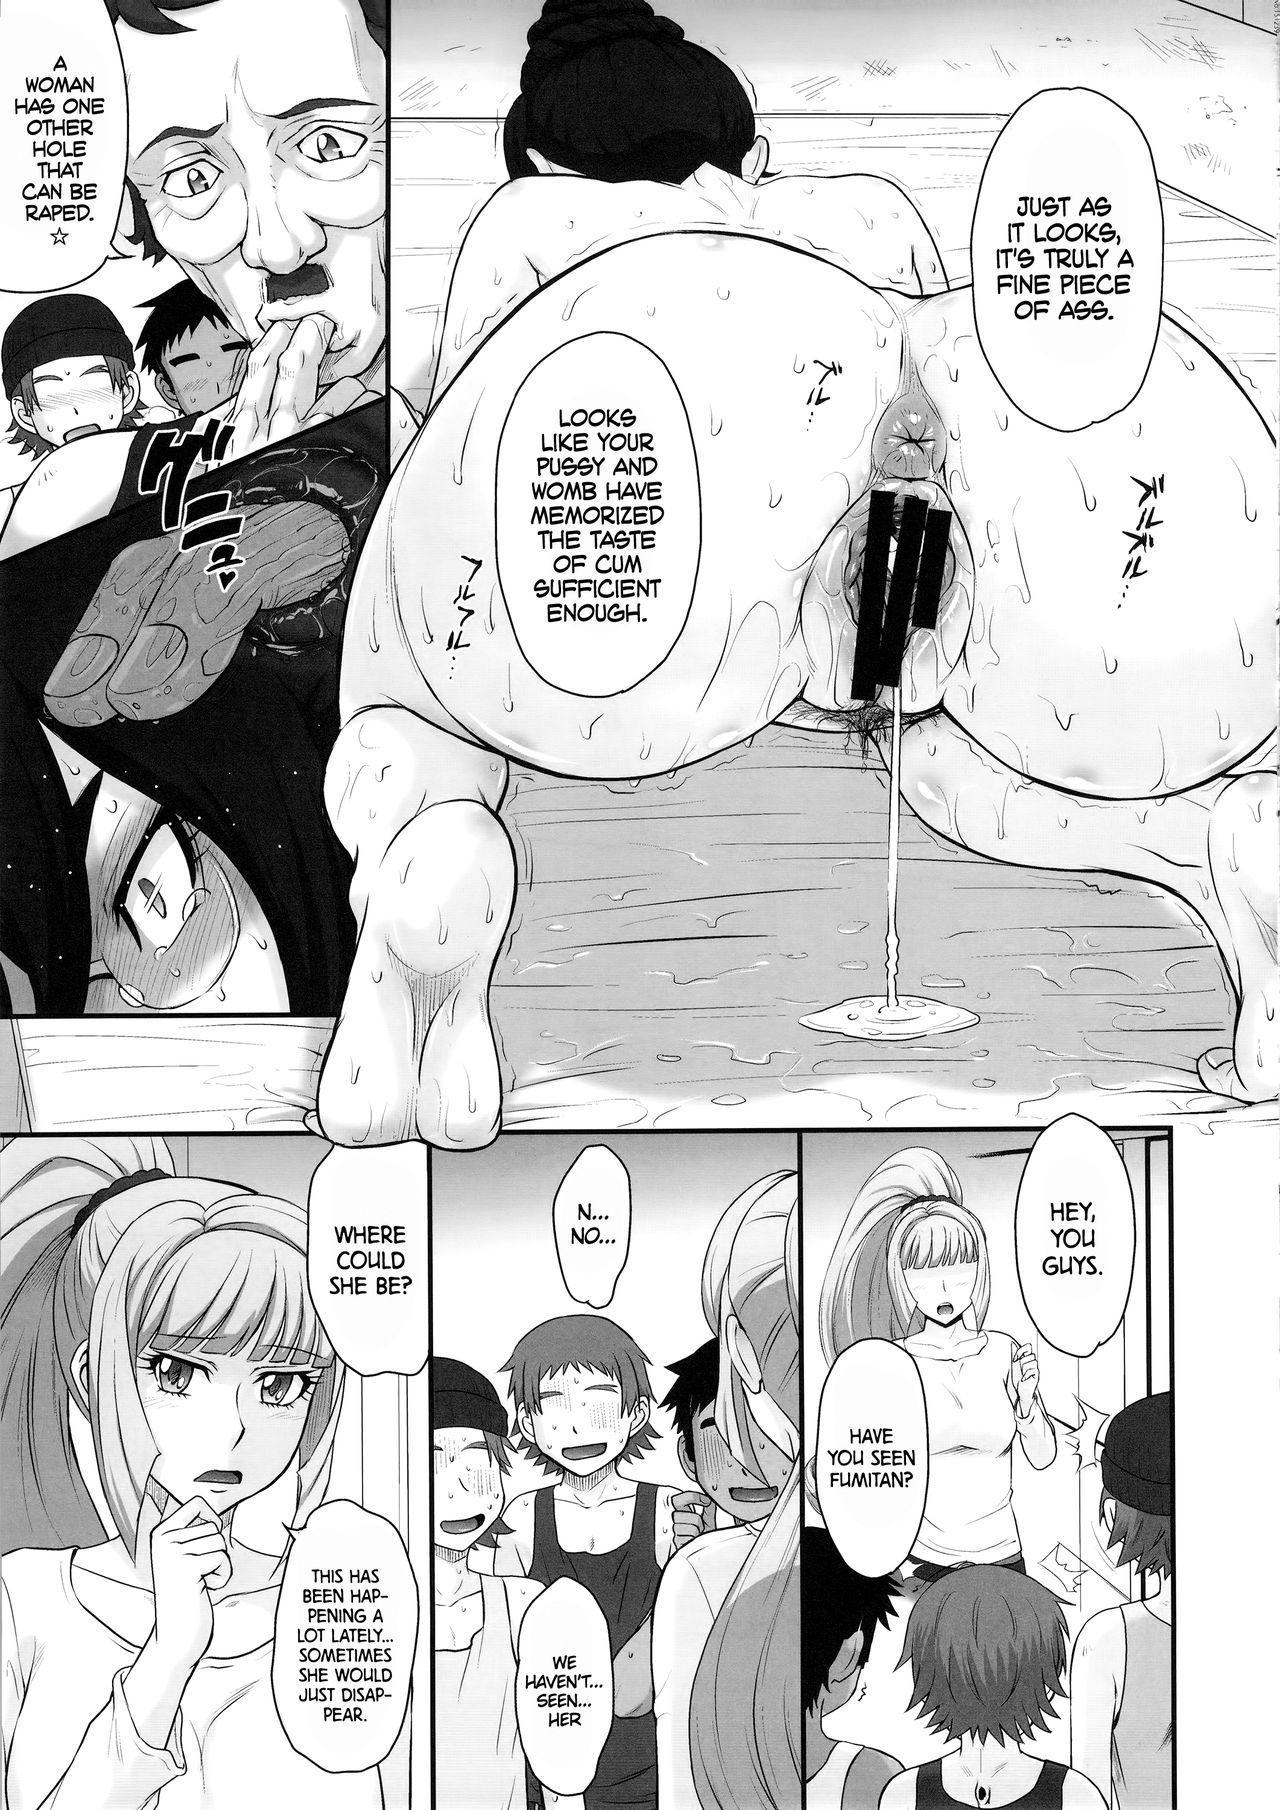 Shota Gui Maid no Gosan to Daishou   Shota Eating Maid's Miscalculation and Compensation 21